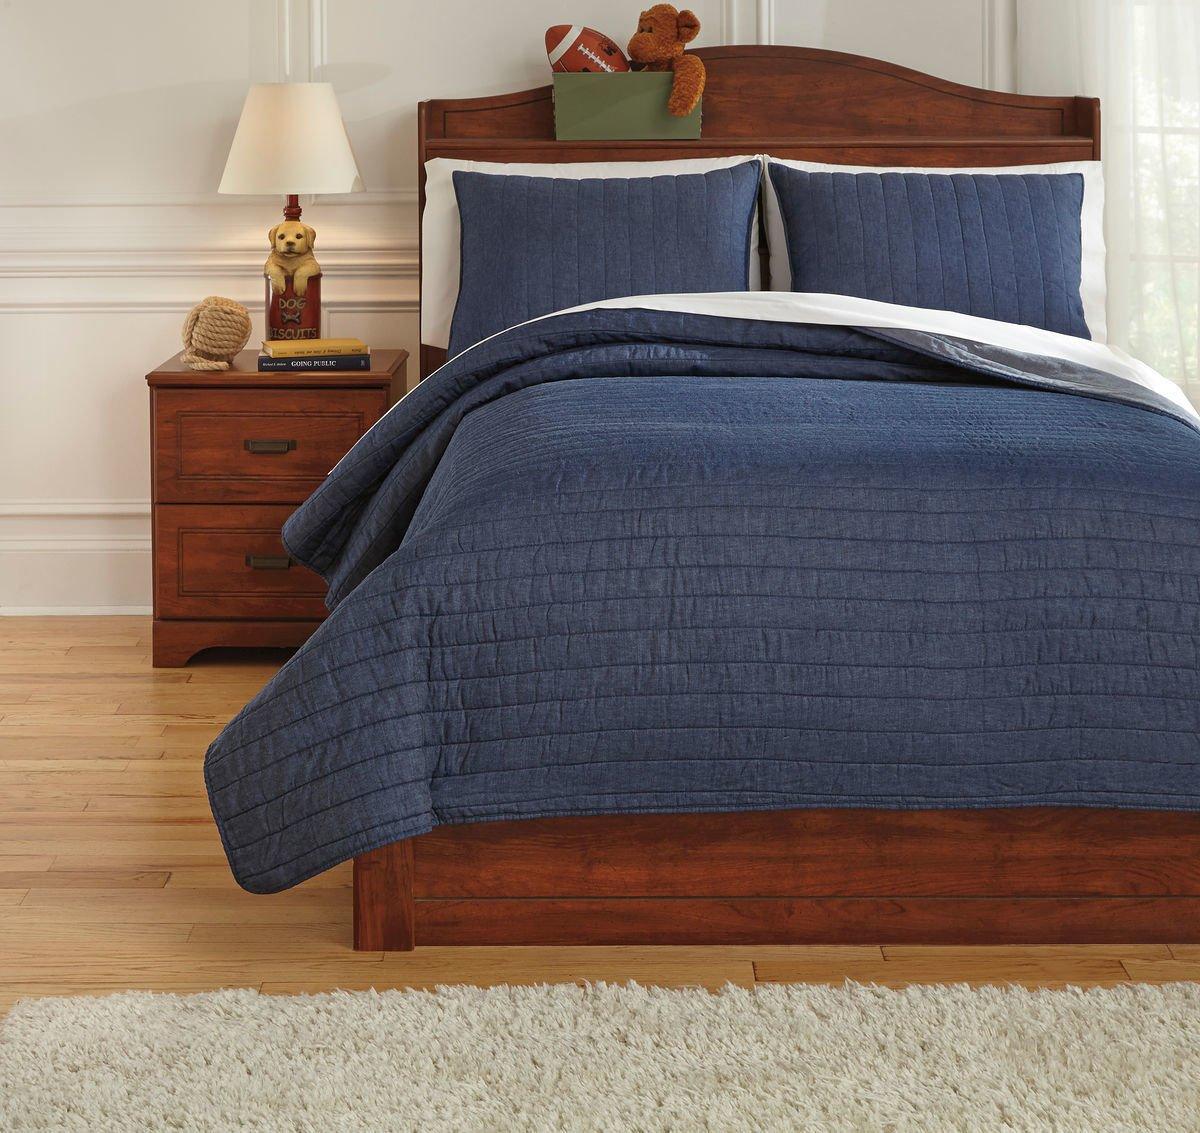 Ashley Furniture Signature Design - Capella Youth Quilt Set - Children's Full Size Comforter Set - Includes Duvet Cover & 2 Shams - Denim Blue